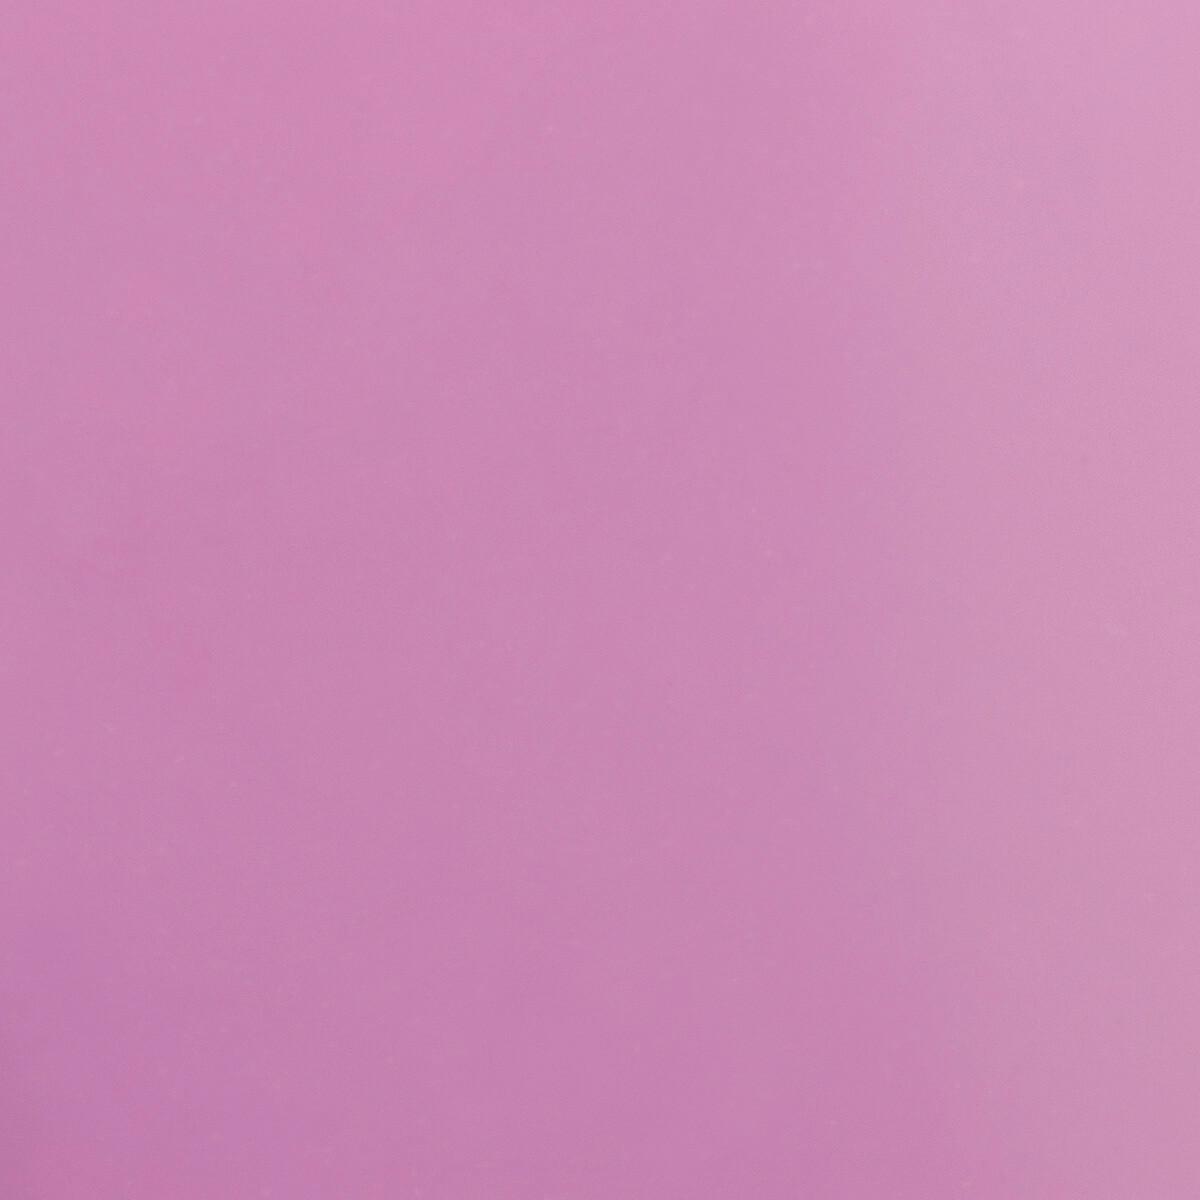 Lilac Hotmark Revolution HTV - Large Roll